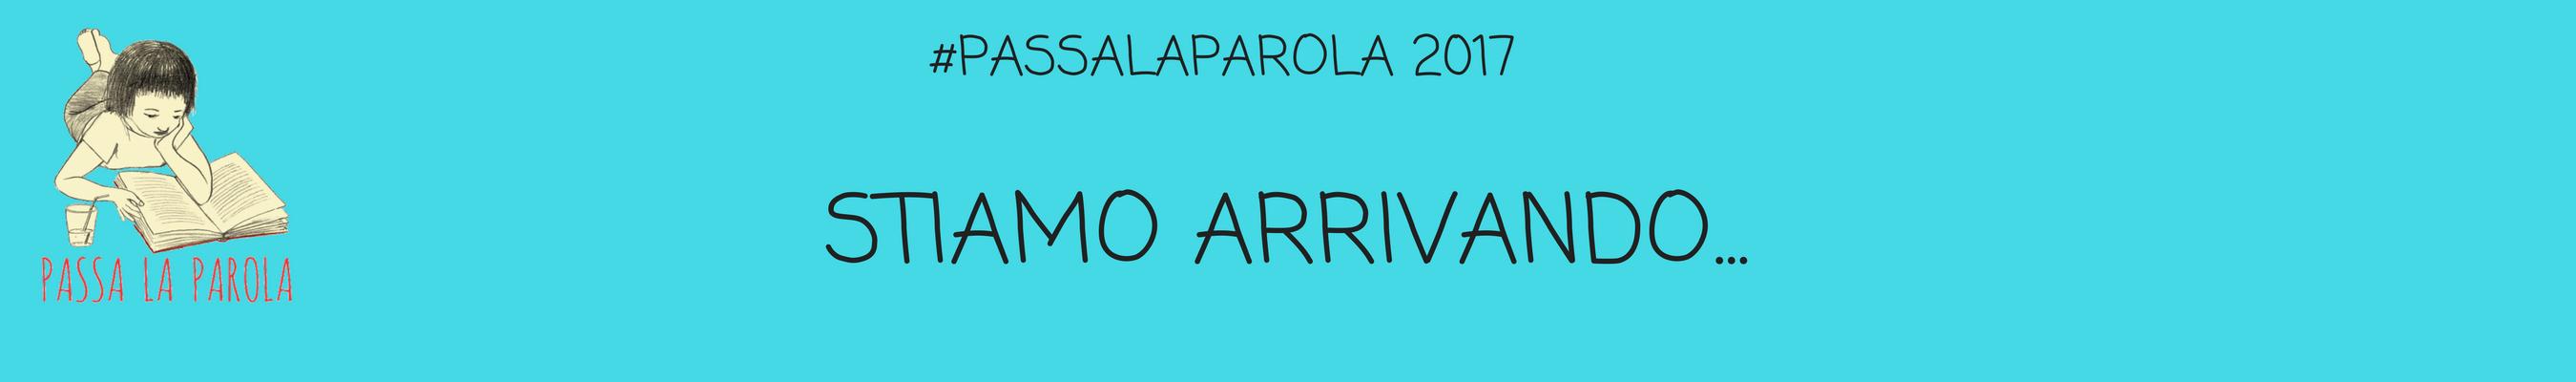 slide_passalaparola_sito_home_coming-jpg